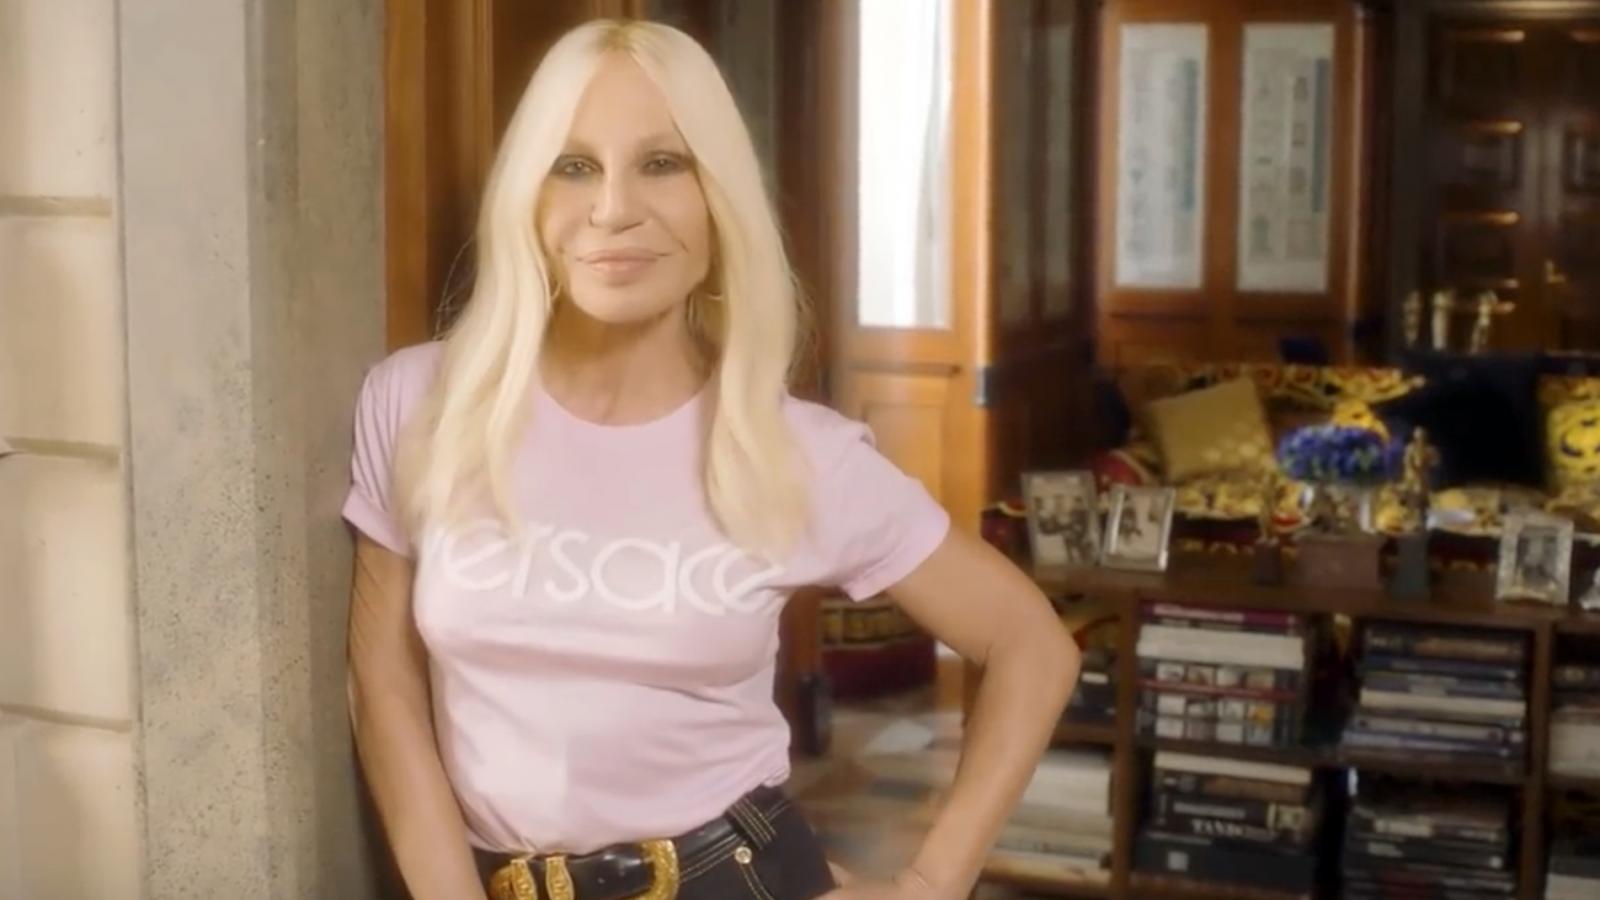 Donatella Versace Κορονοϊός: Γράμμα από το Μιλάνο